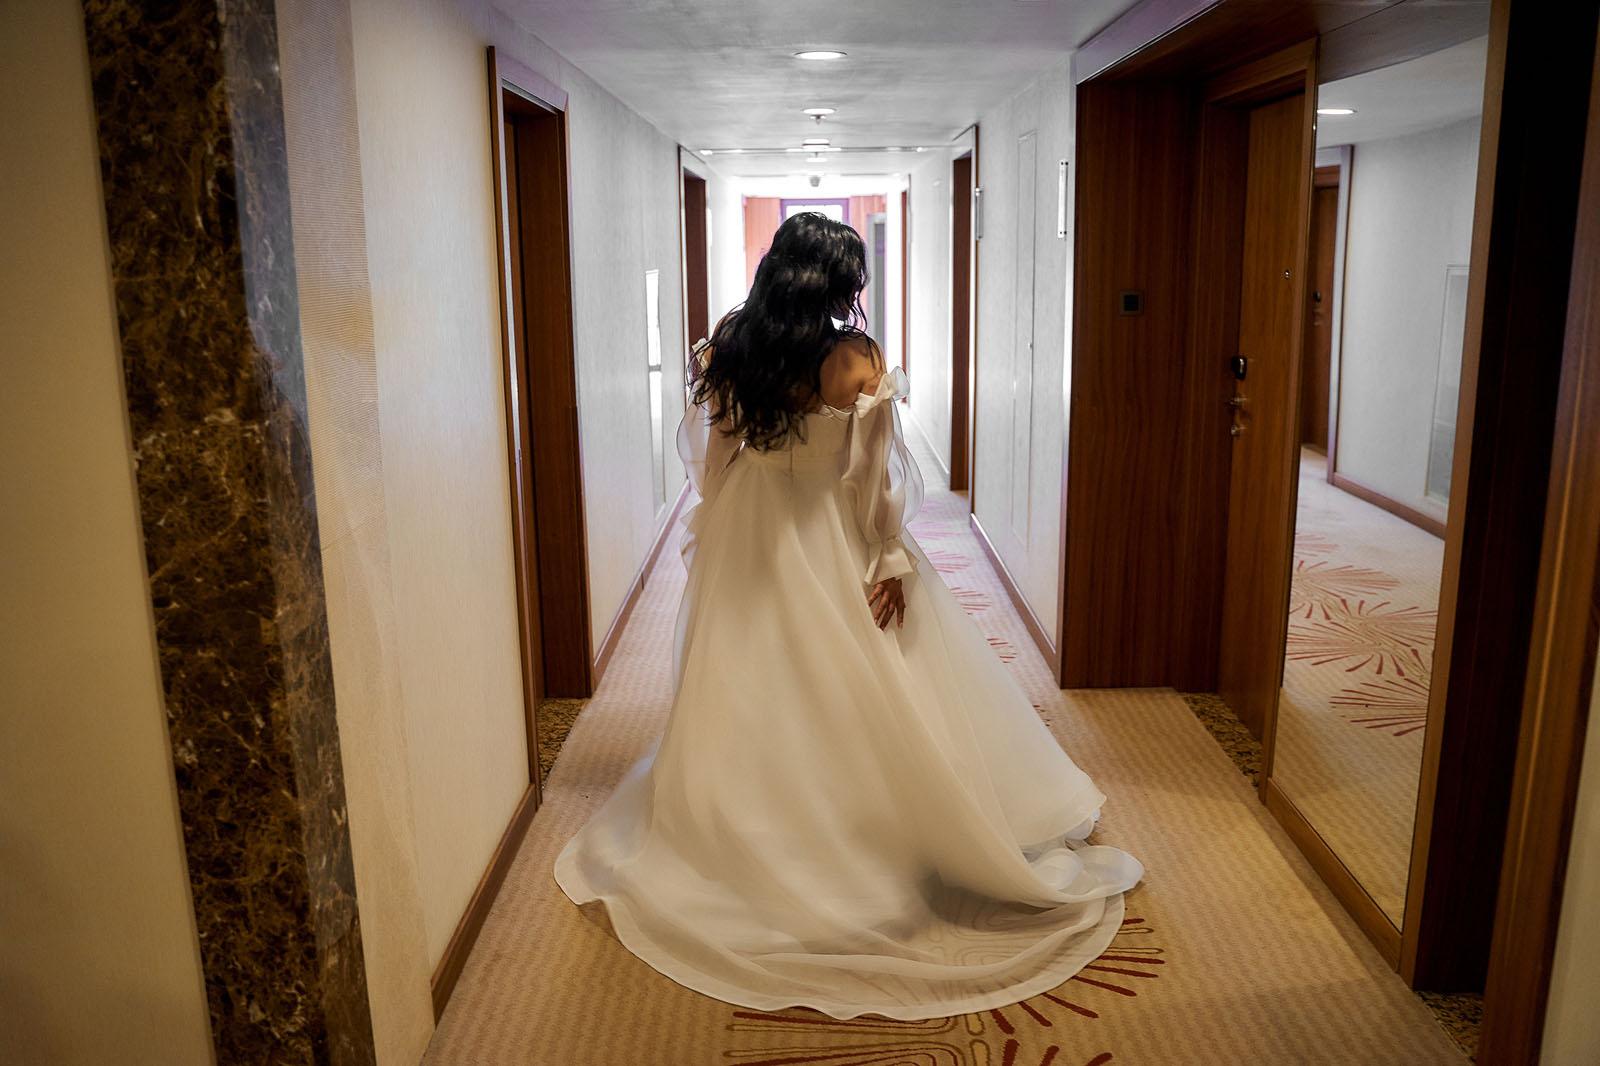 wedding@bekarev2021-04-10-09-05-38.jpg